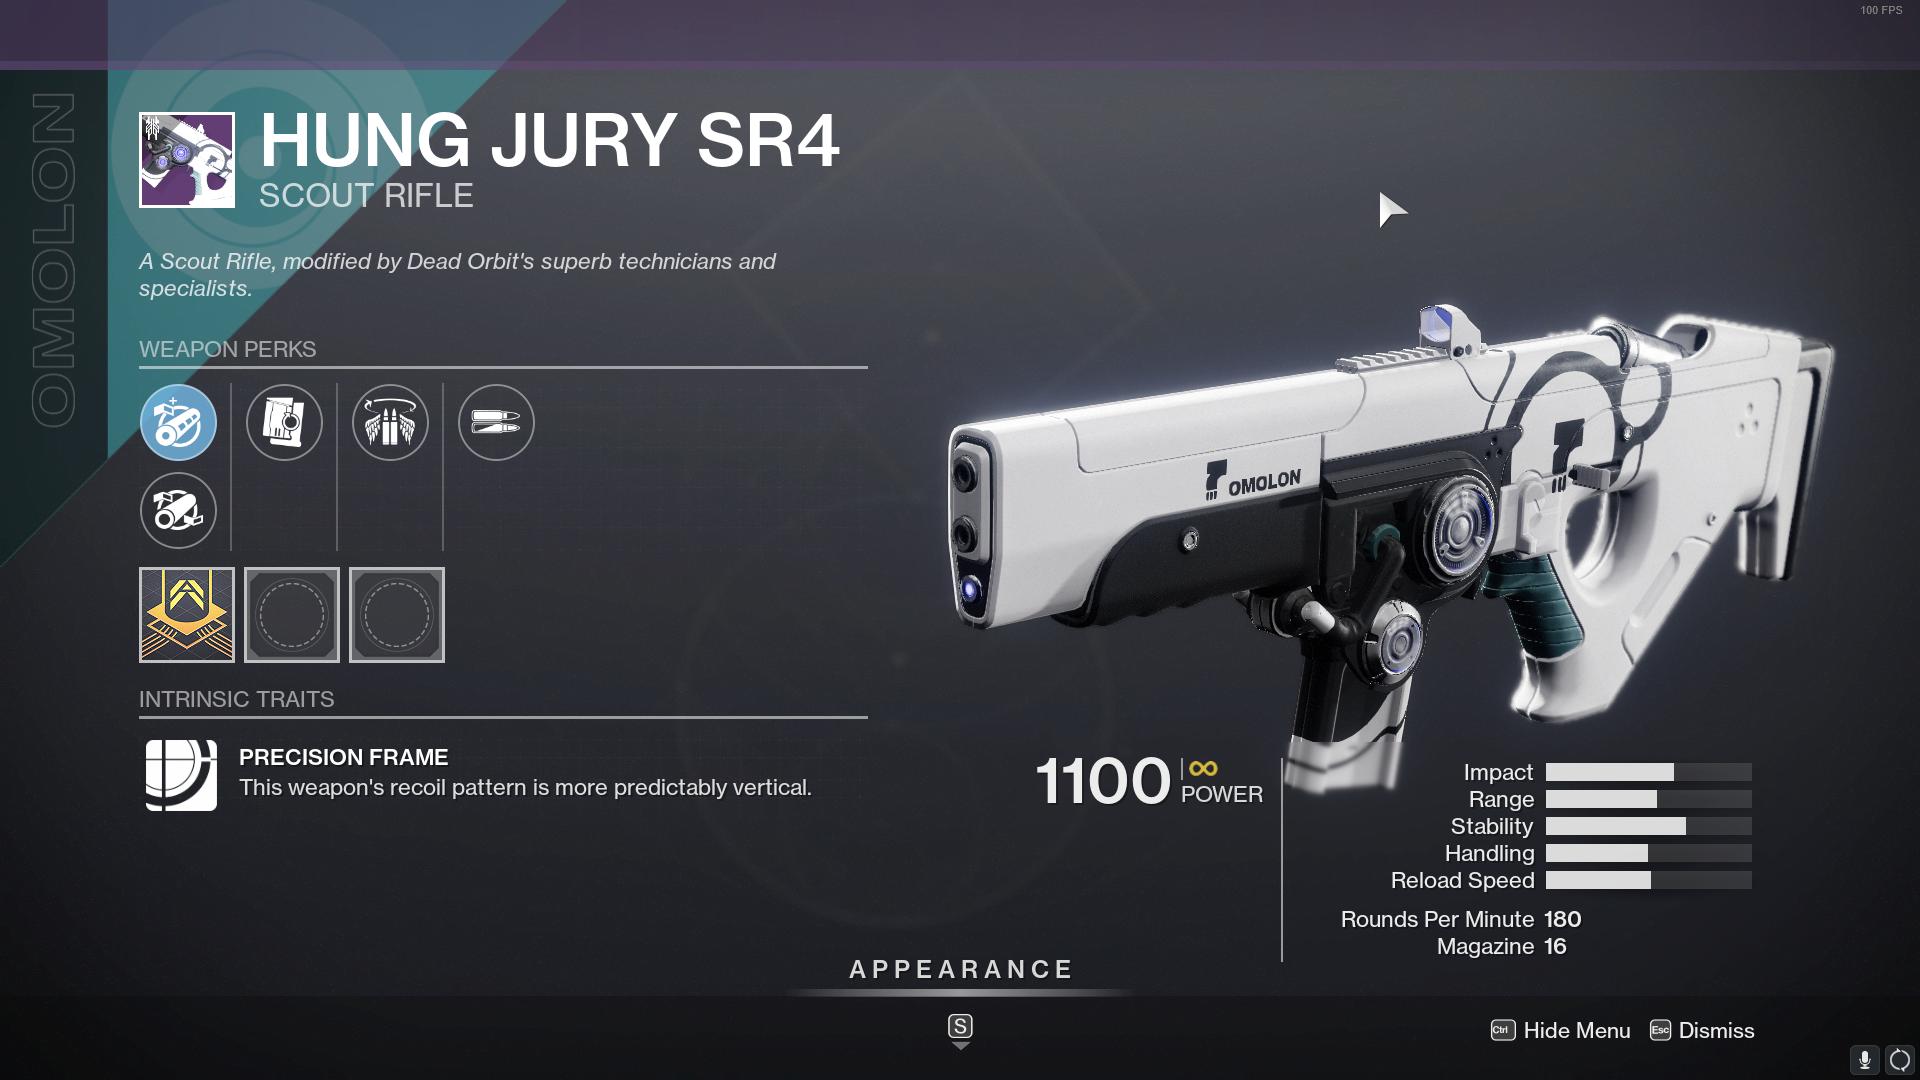 Destiny 2 Hung Jury God Roll